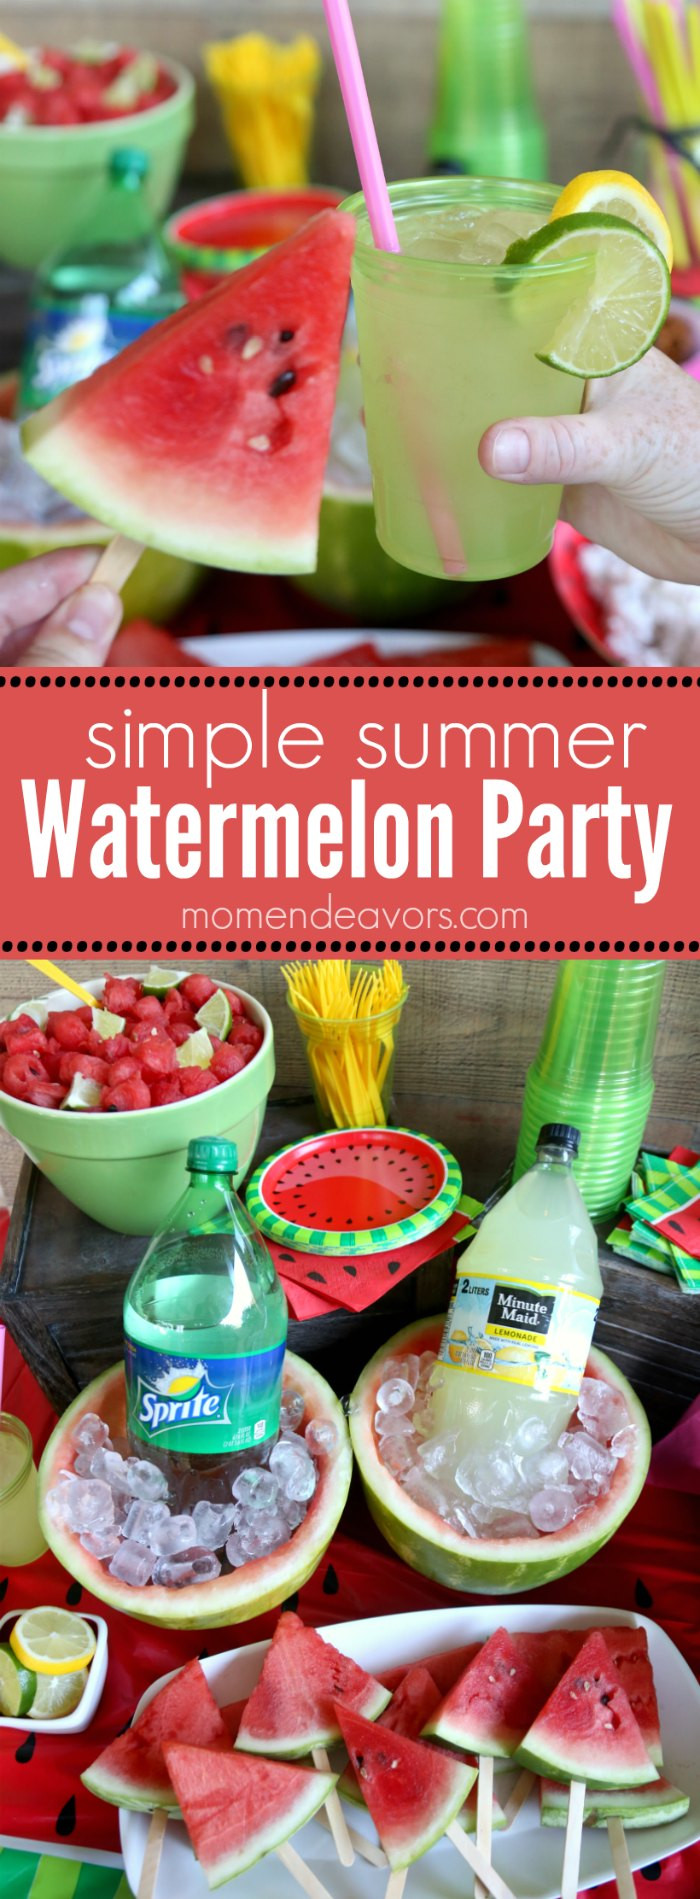 Cool Summer Party Ideas  Summer Fun Watermelon Party Ideas